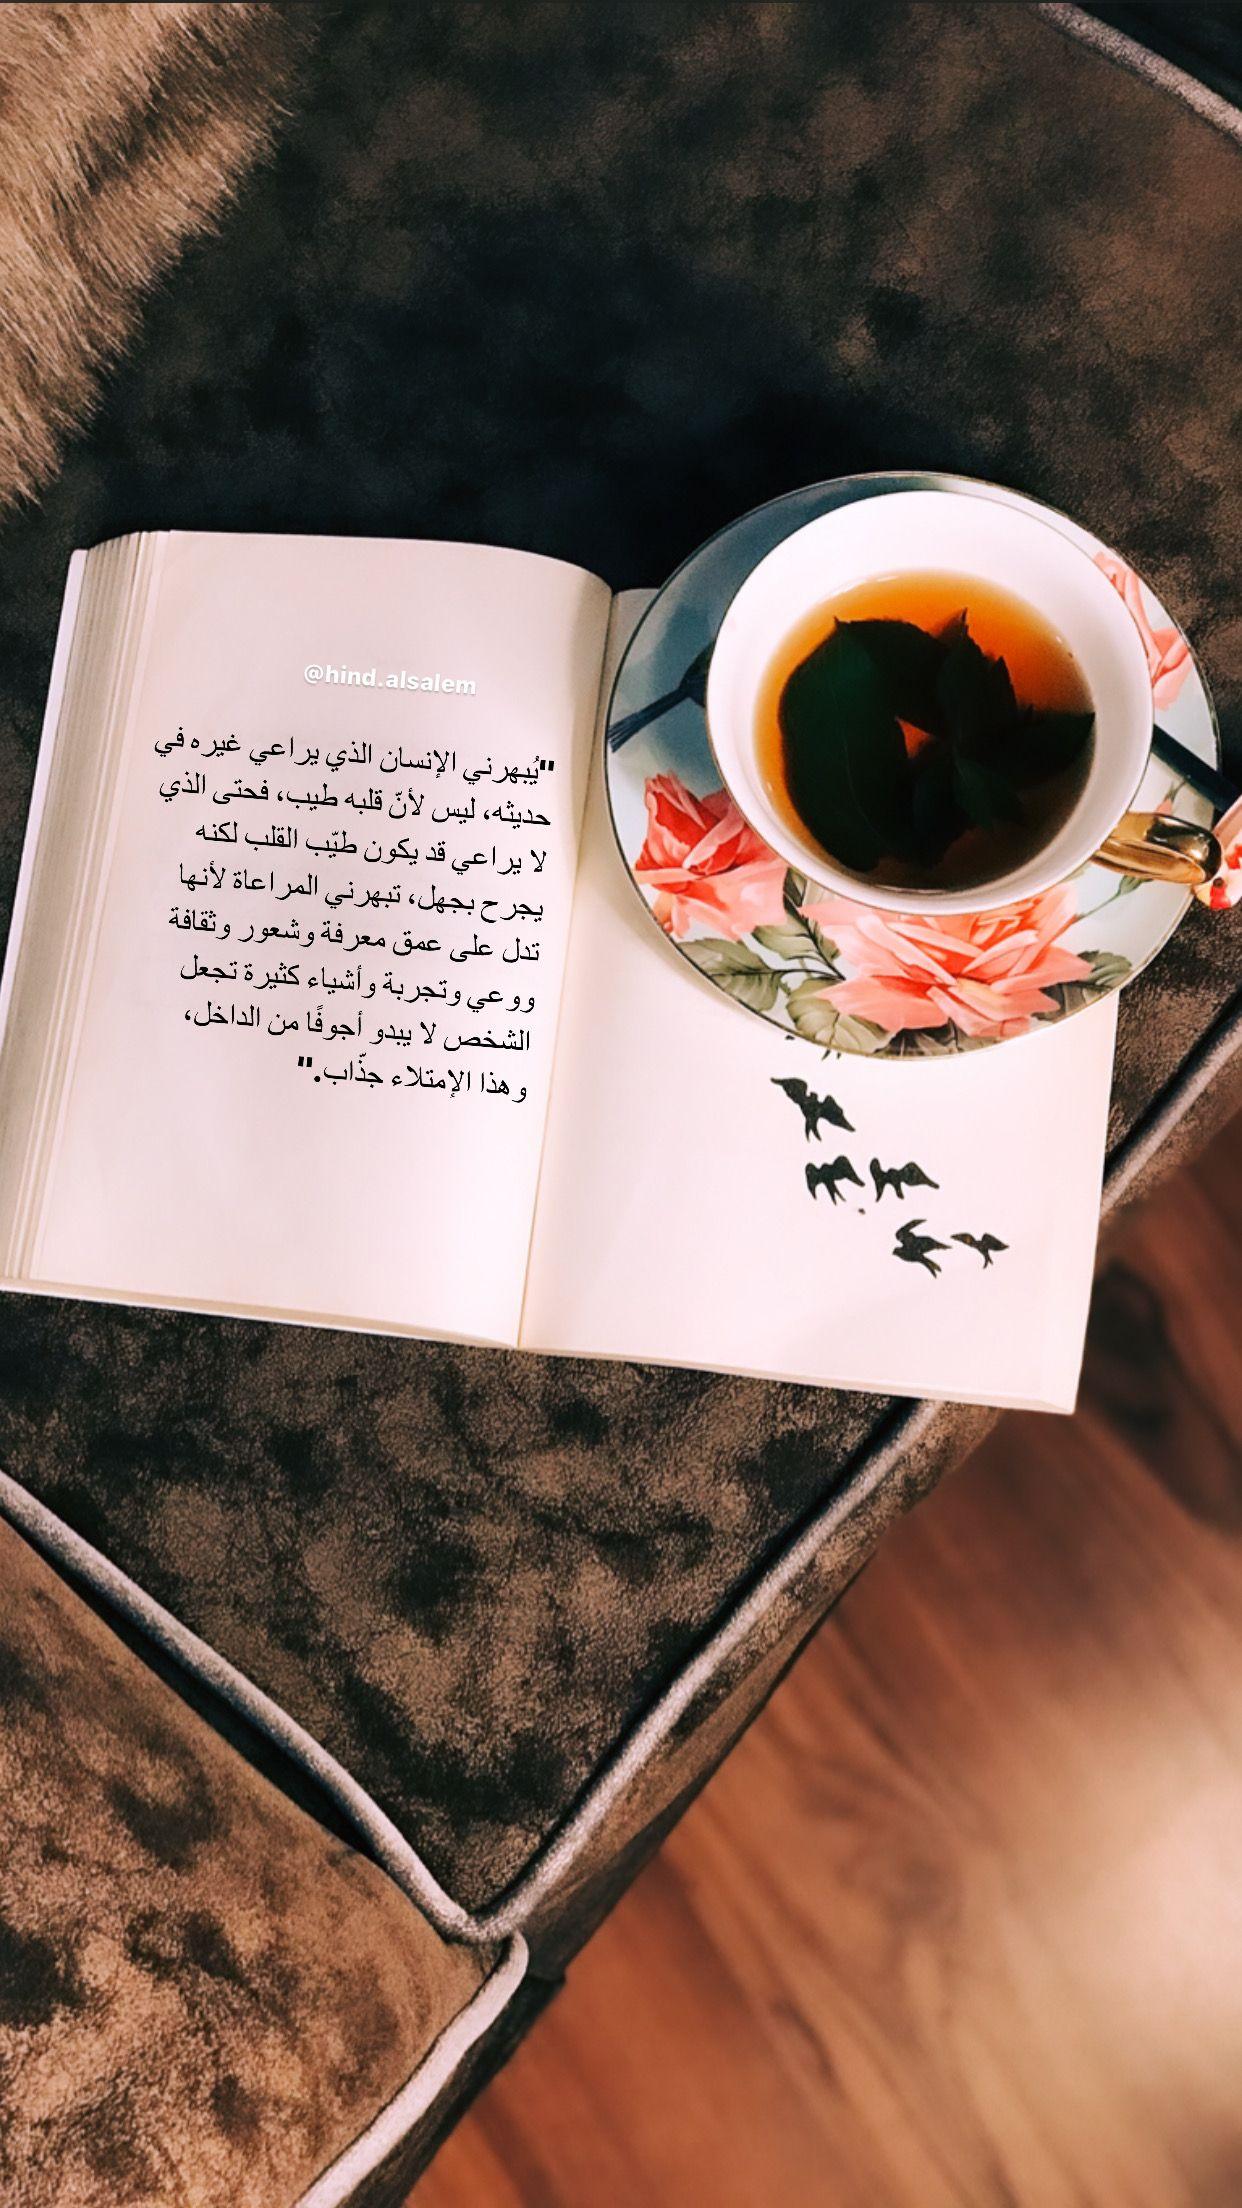 Photo Coffee Coffe Love Photography Lover Instagram Snap تصويري تصوير احترافي سناب صوره ابداع حب عشق ورد مساء ا Cool Words Arabic Quotes Words